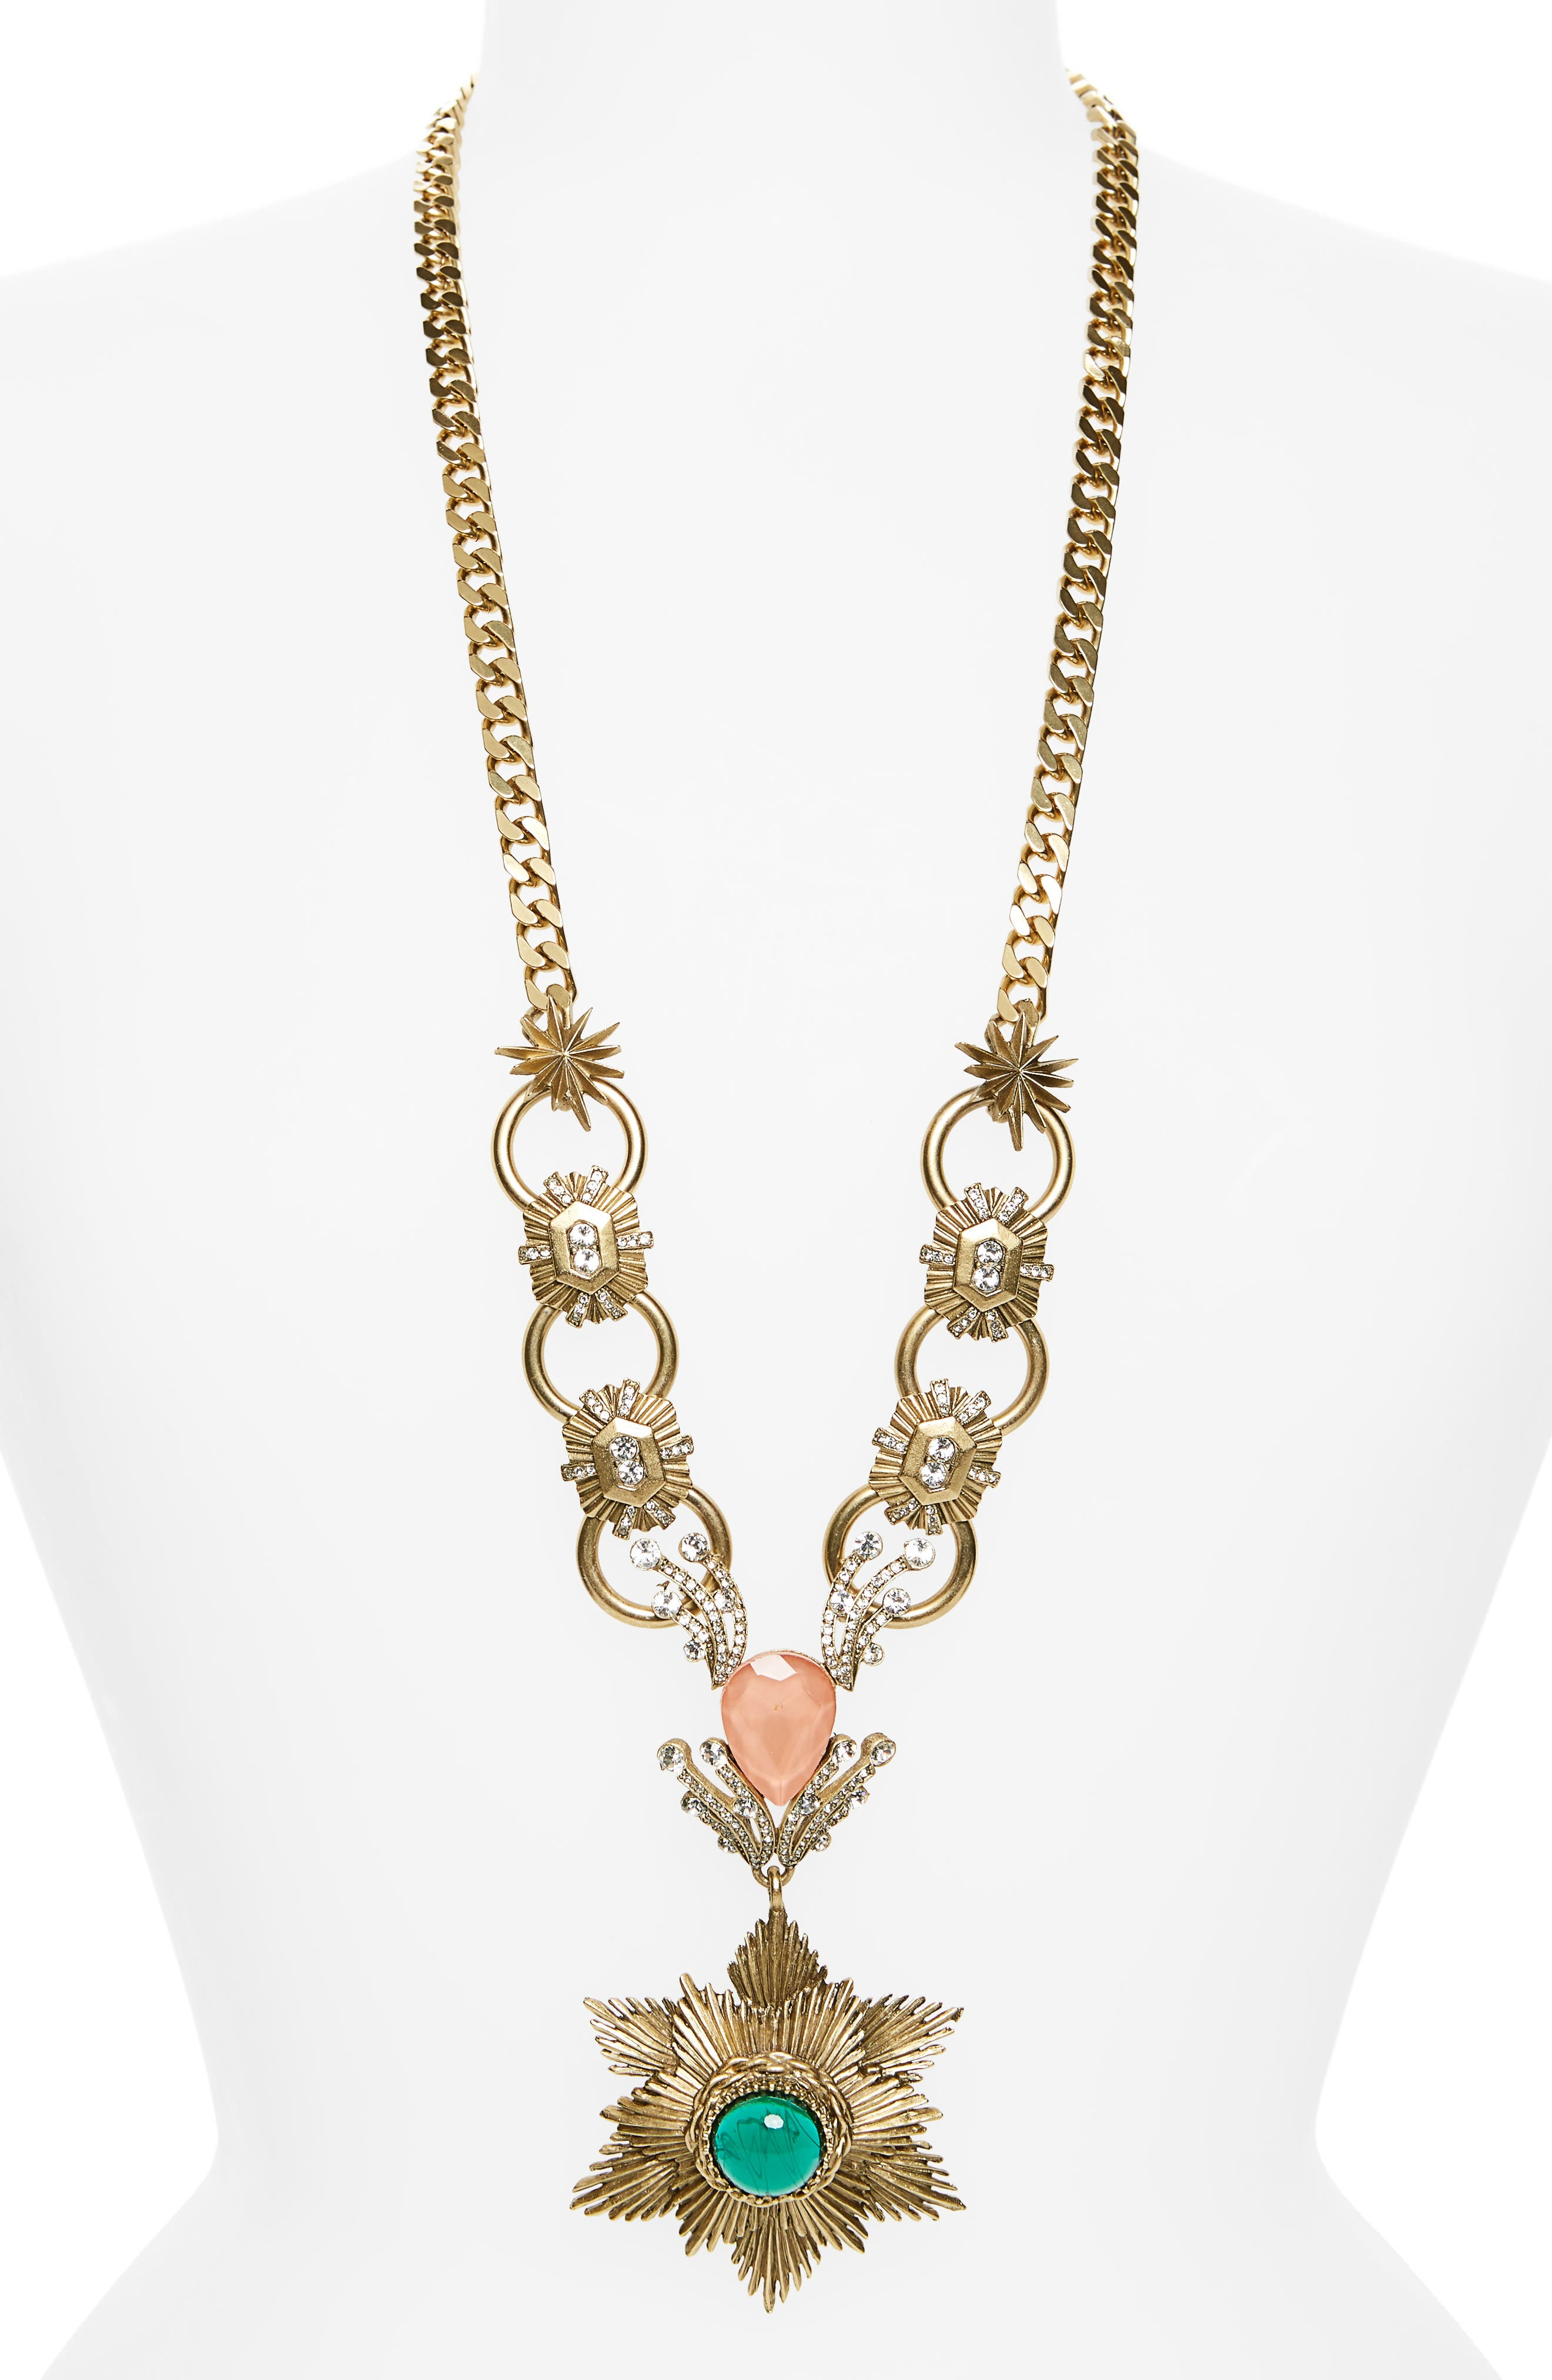 Alternate Image 1 Selected - Loren Hope Gloria Pendant Necklace